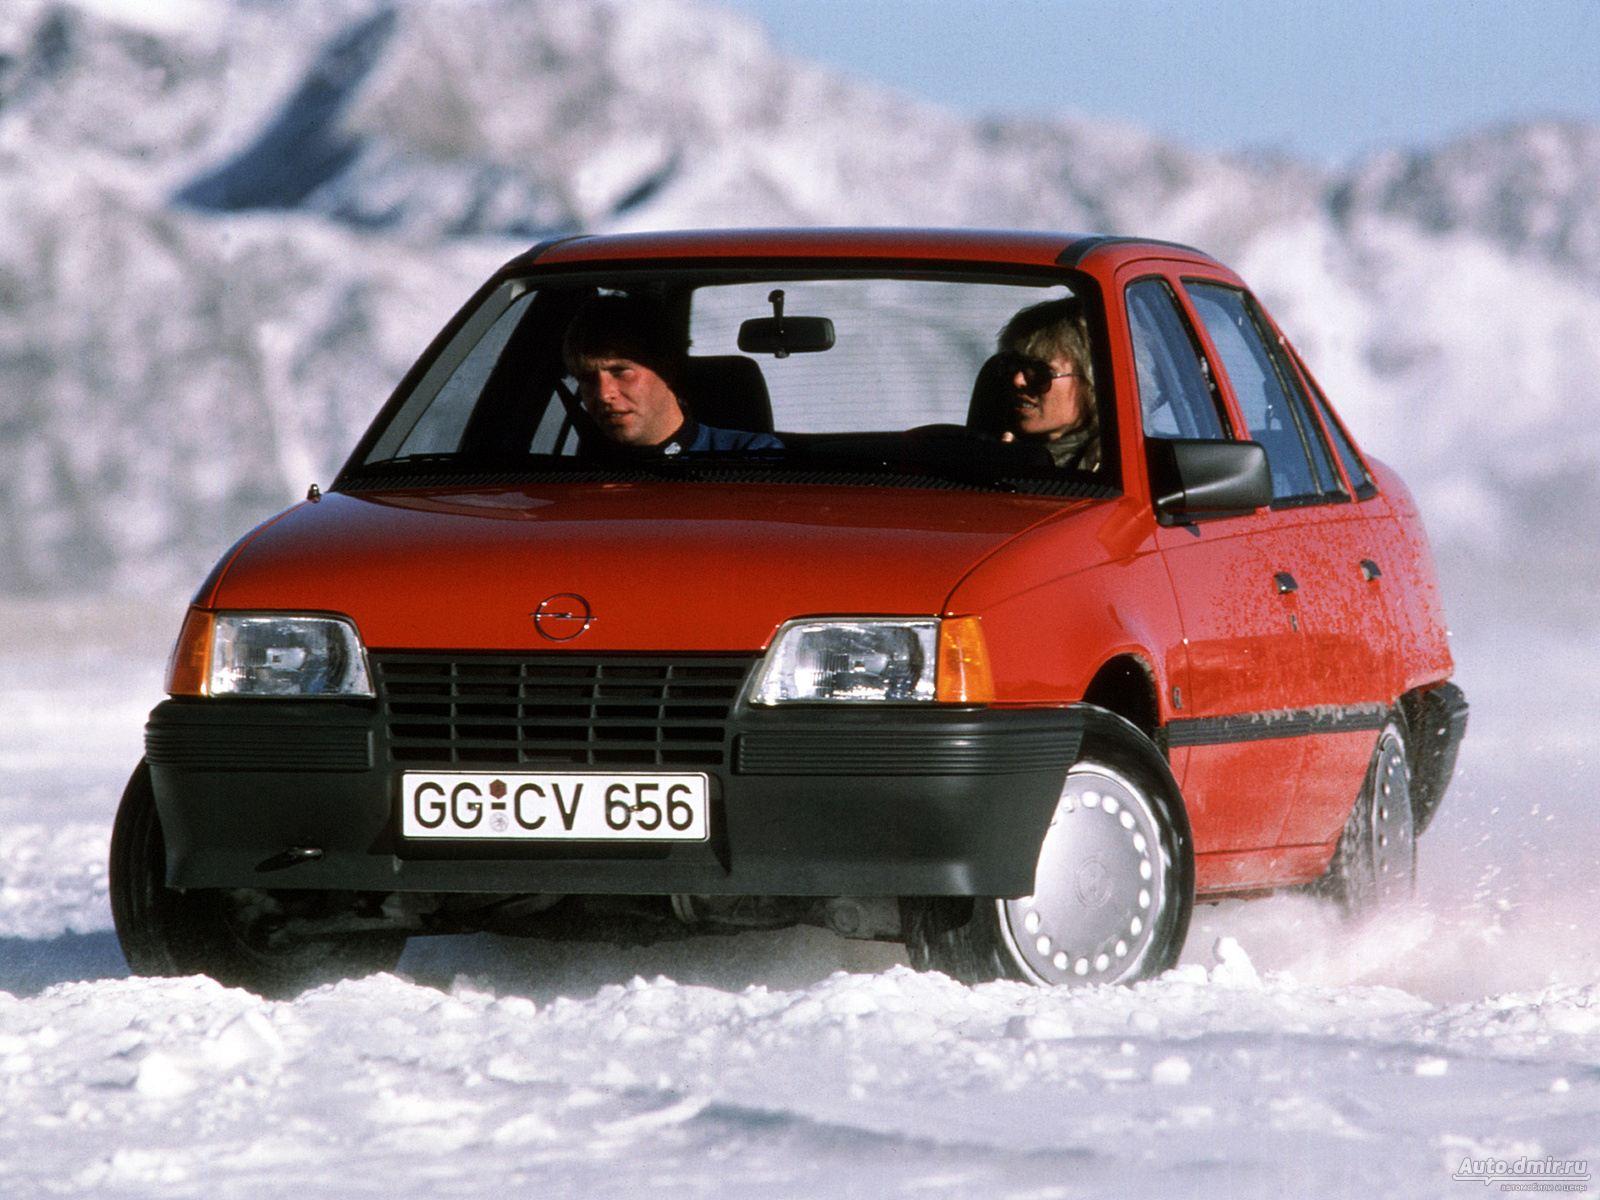 Opel Kadett E 1984 - 1991 Station wagon 5 door #1